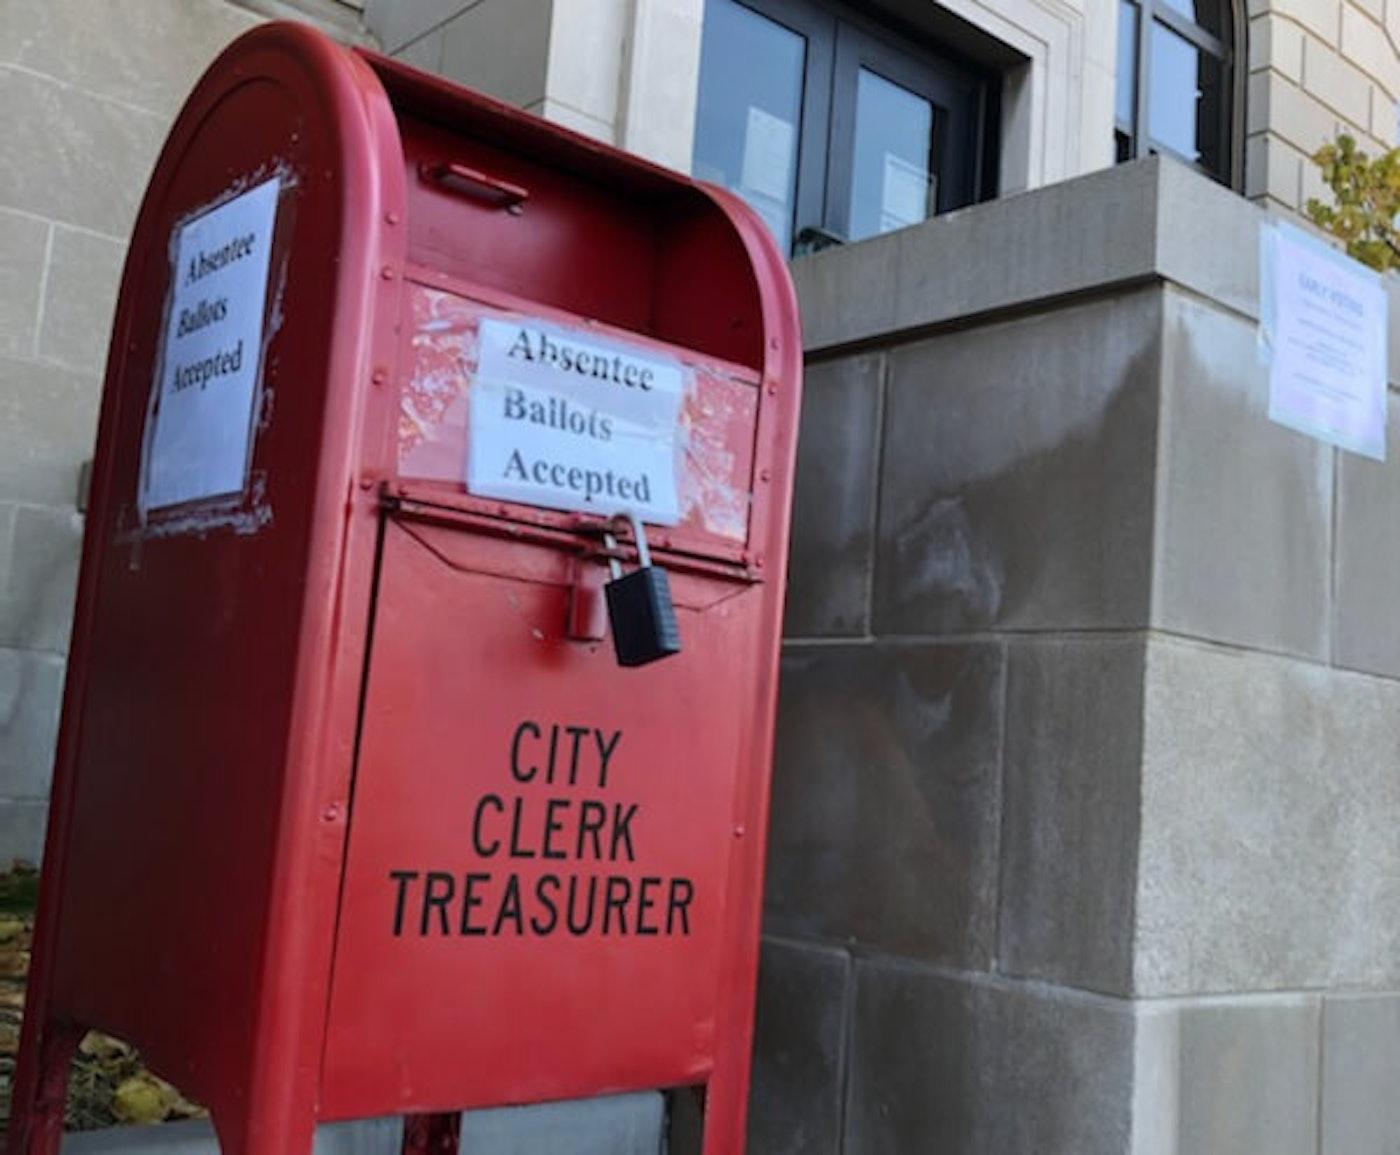 An absentee ballot drop box outside Racine City Hall. (Photo courtesy of Matt Sadowski)